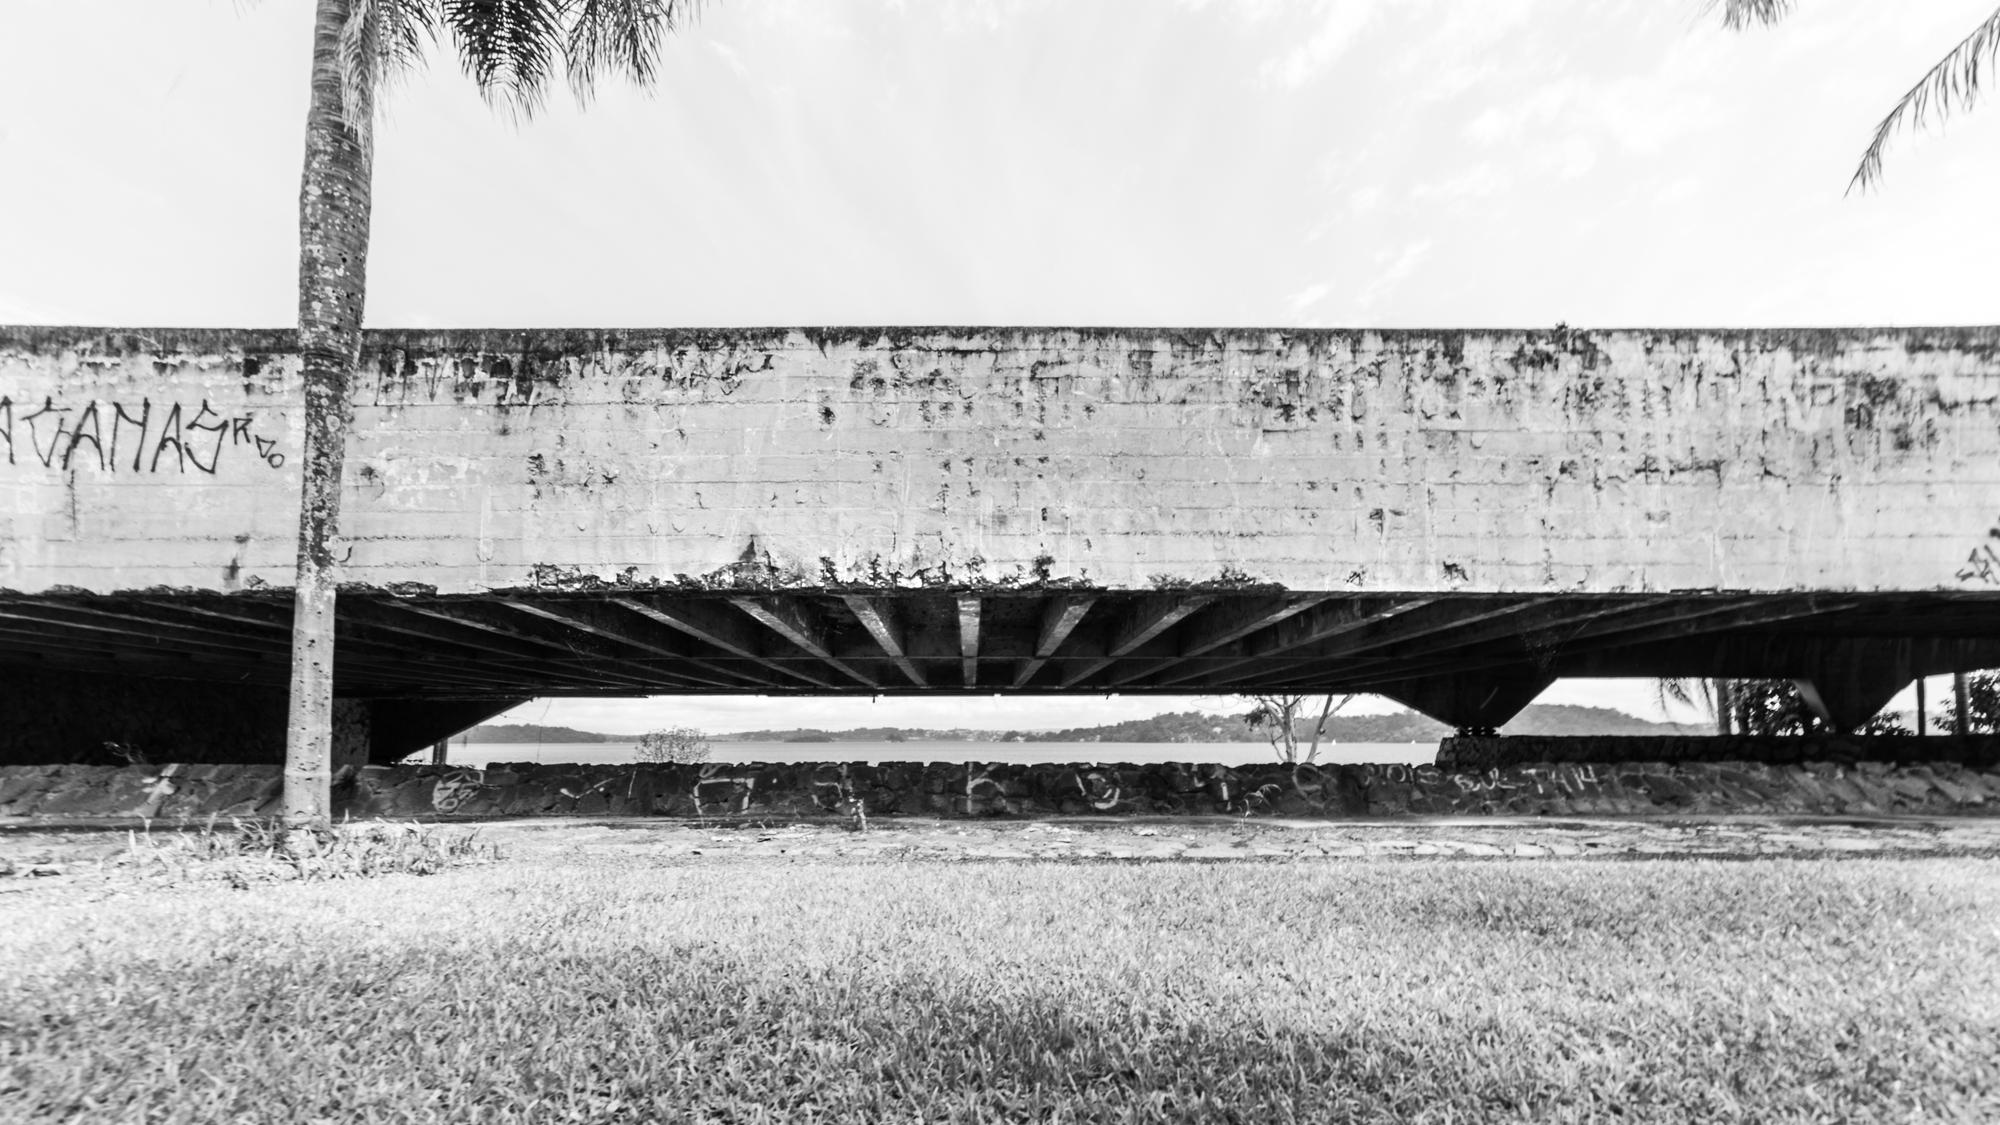 Brutalismo e Abandono: Santa Paula Iate Clube pelas lentes de Guilherme Pucci